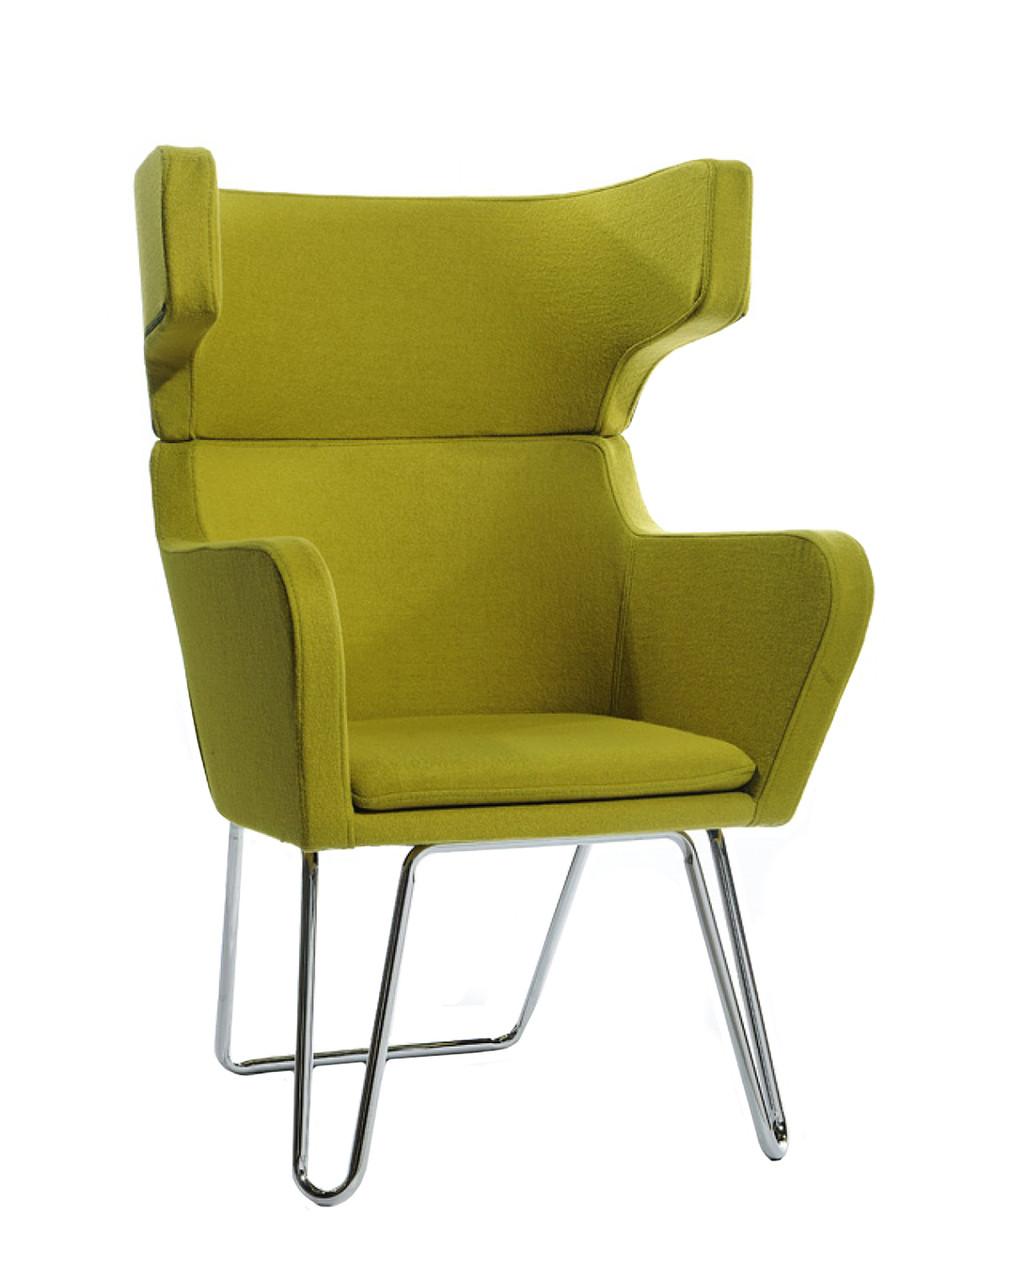 Alan Green Living Room Chair Green Lounge Chair Advanced Interior Designs